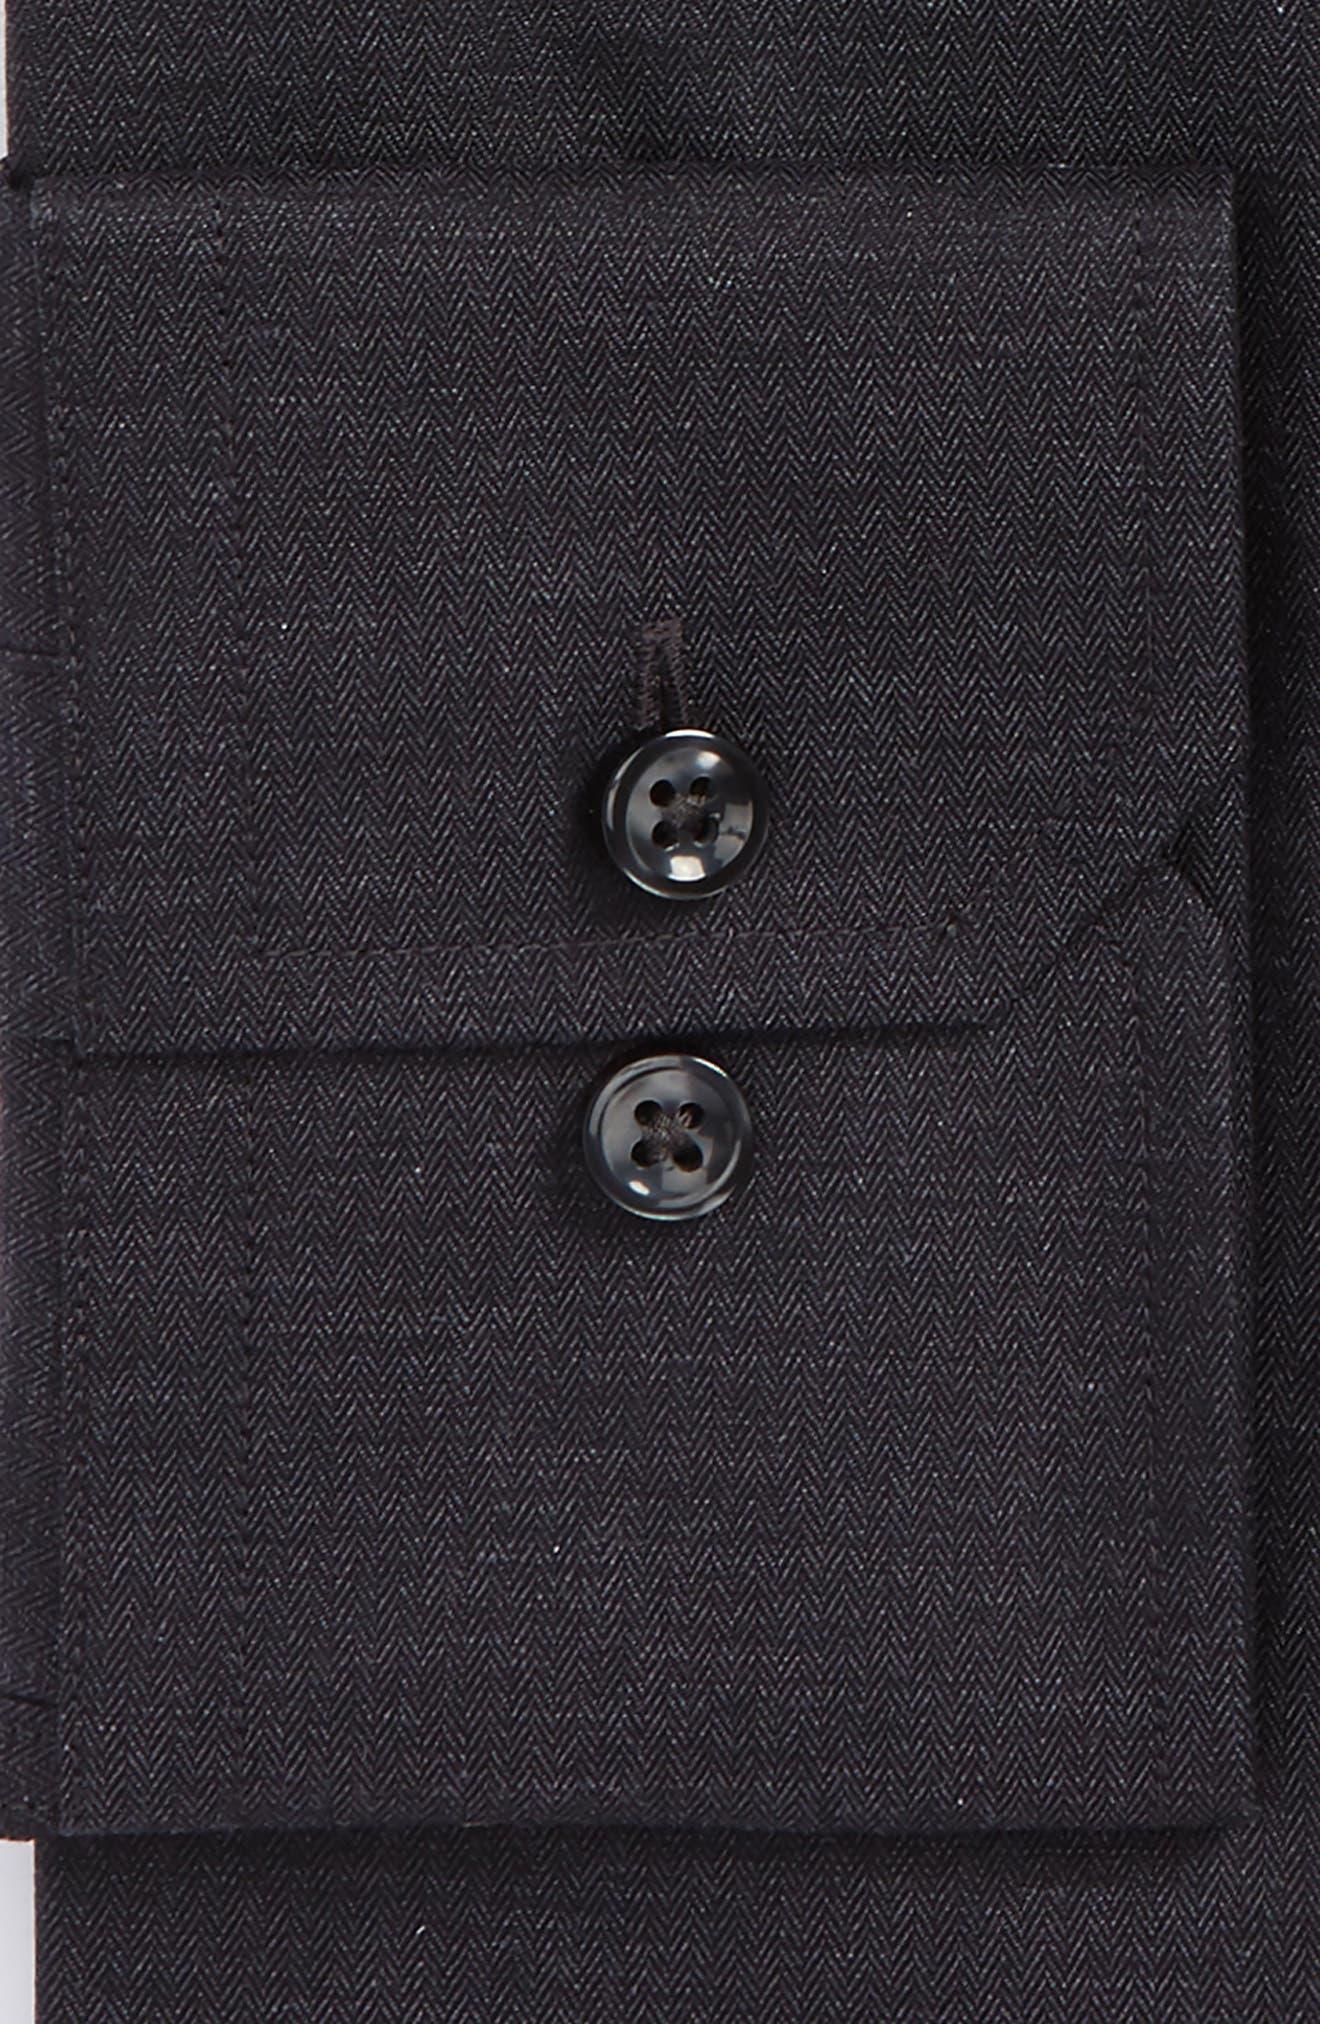 Trim Fit Herringbone Dress Shirt,                             Alternate thumbnail 2, color,                             013